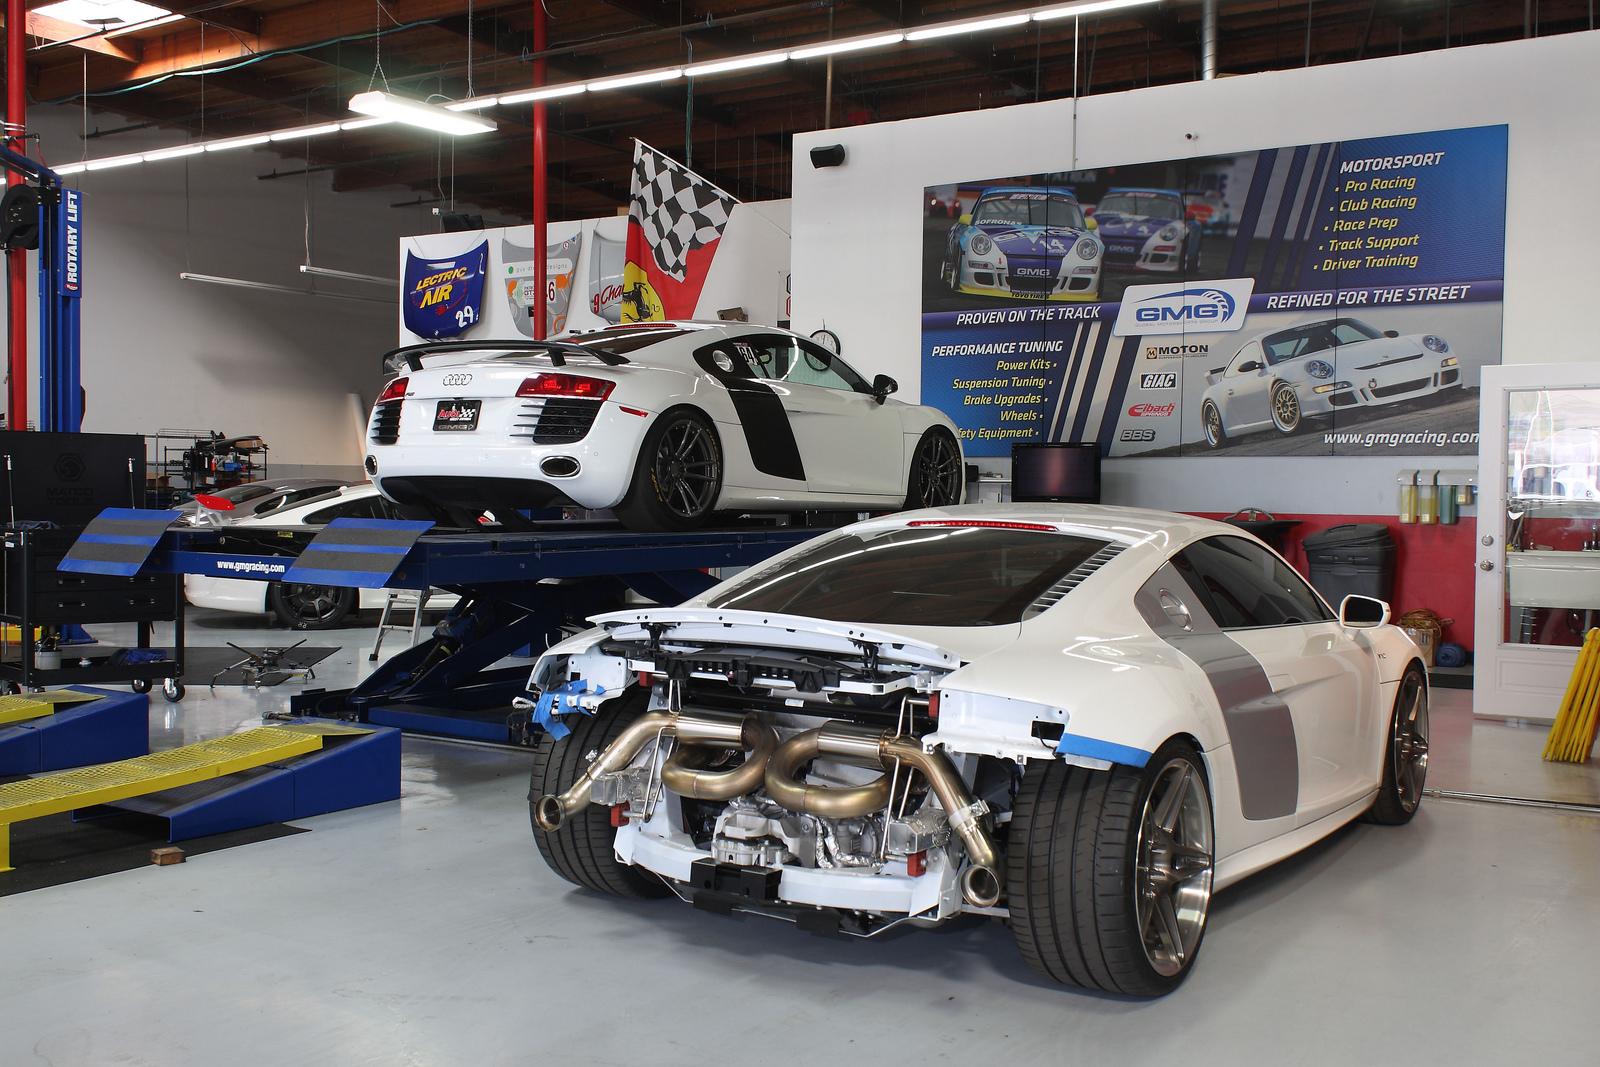 R8 V10 Gmg Racing